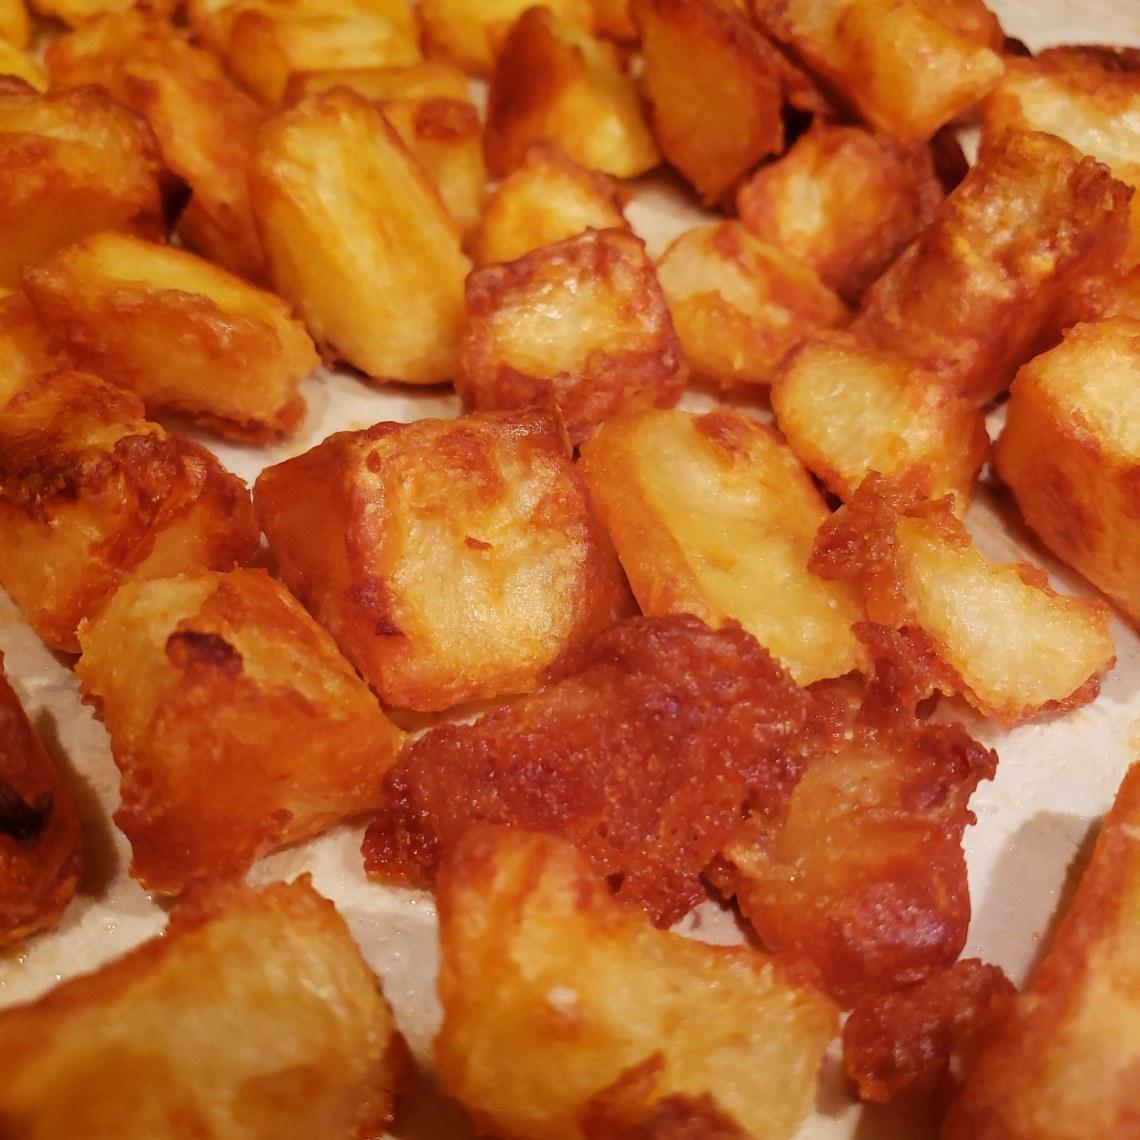 Close up of super crispy oven roasted potatoes